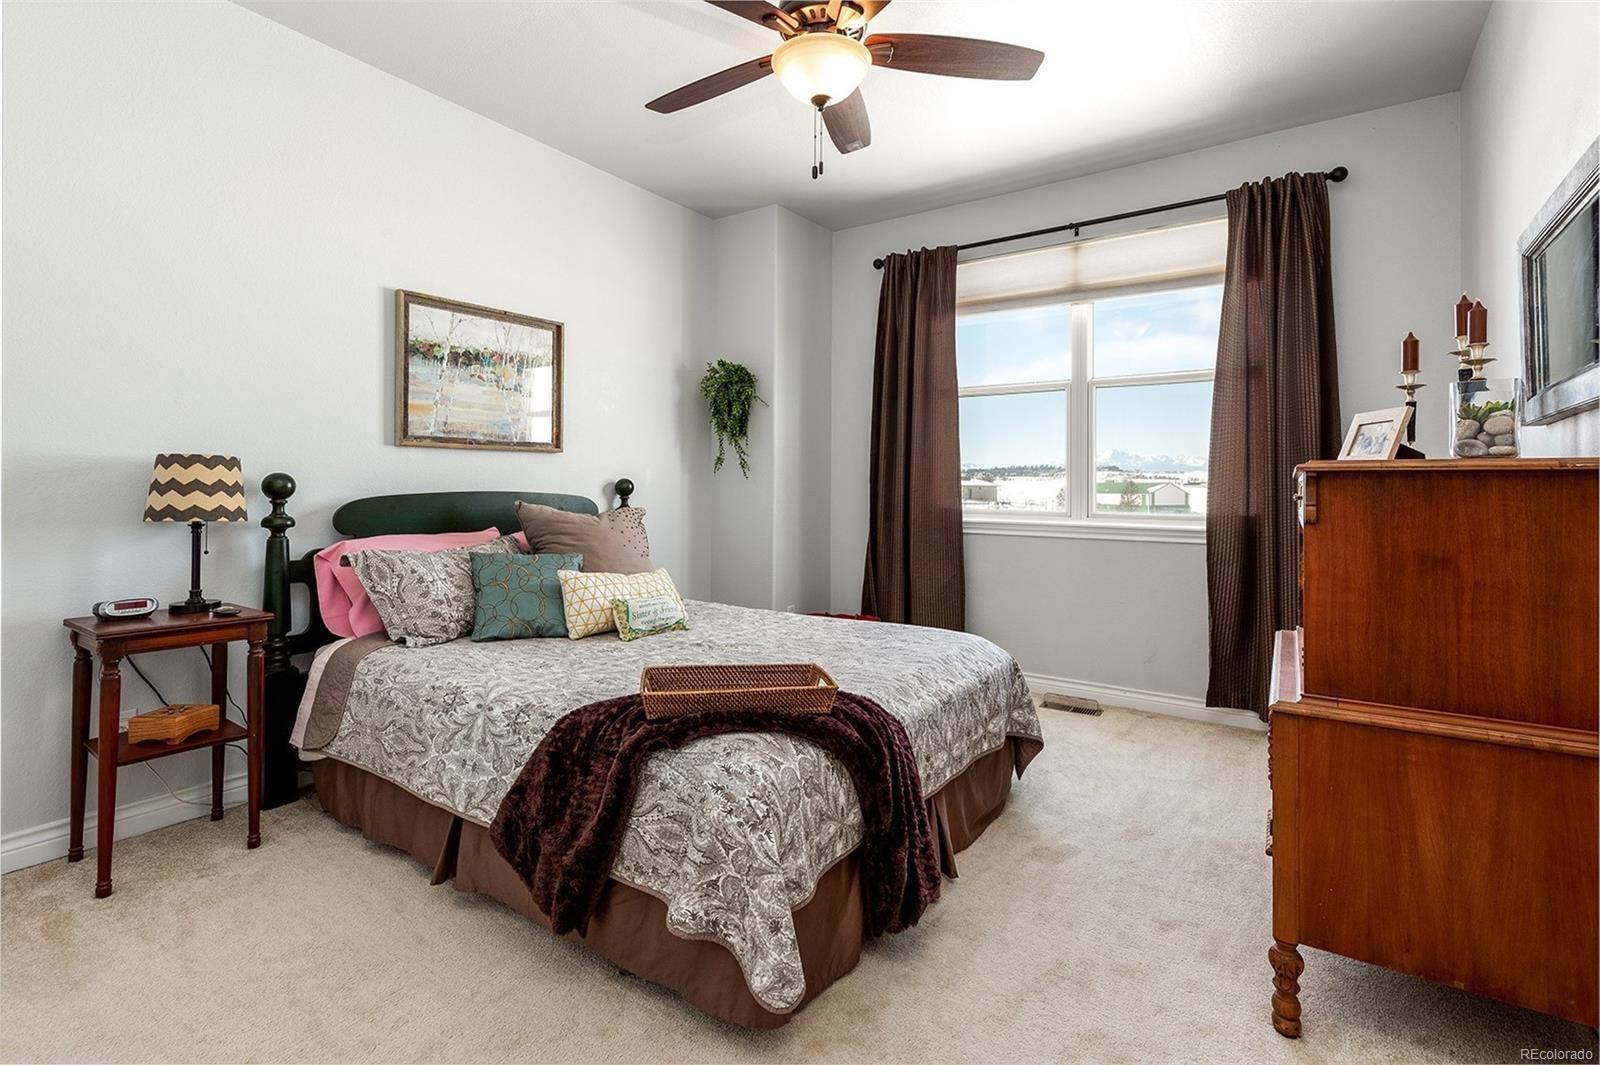 MLS# 4807349 - 22 - 15325 Terra Ridge Circle, Colorado Springs, CO 80908